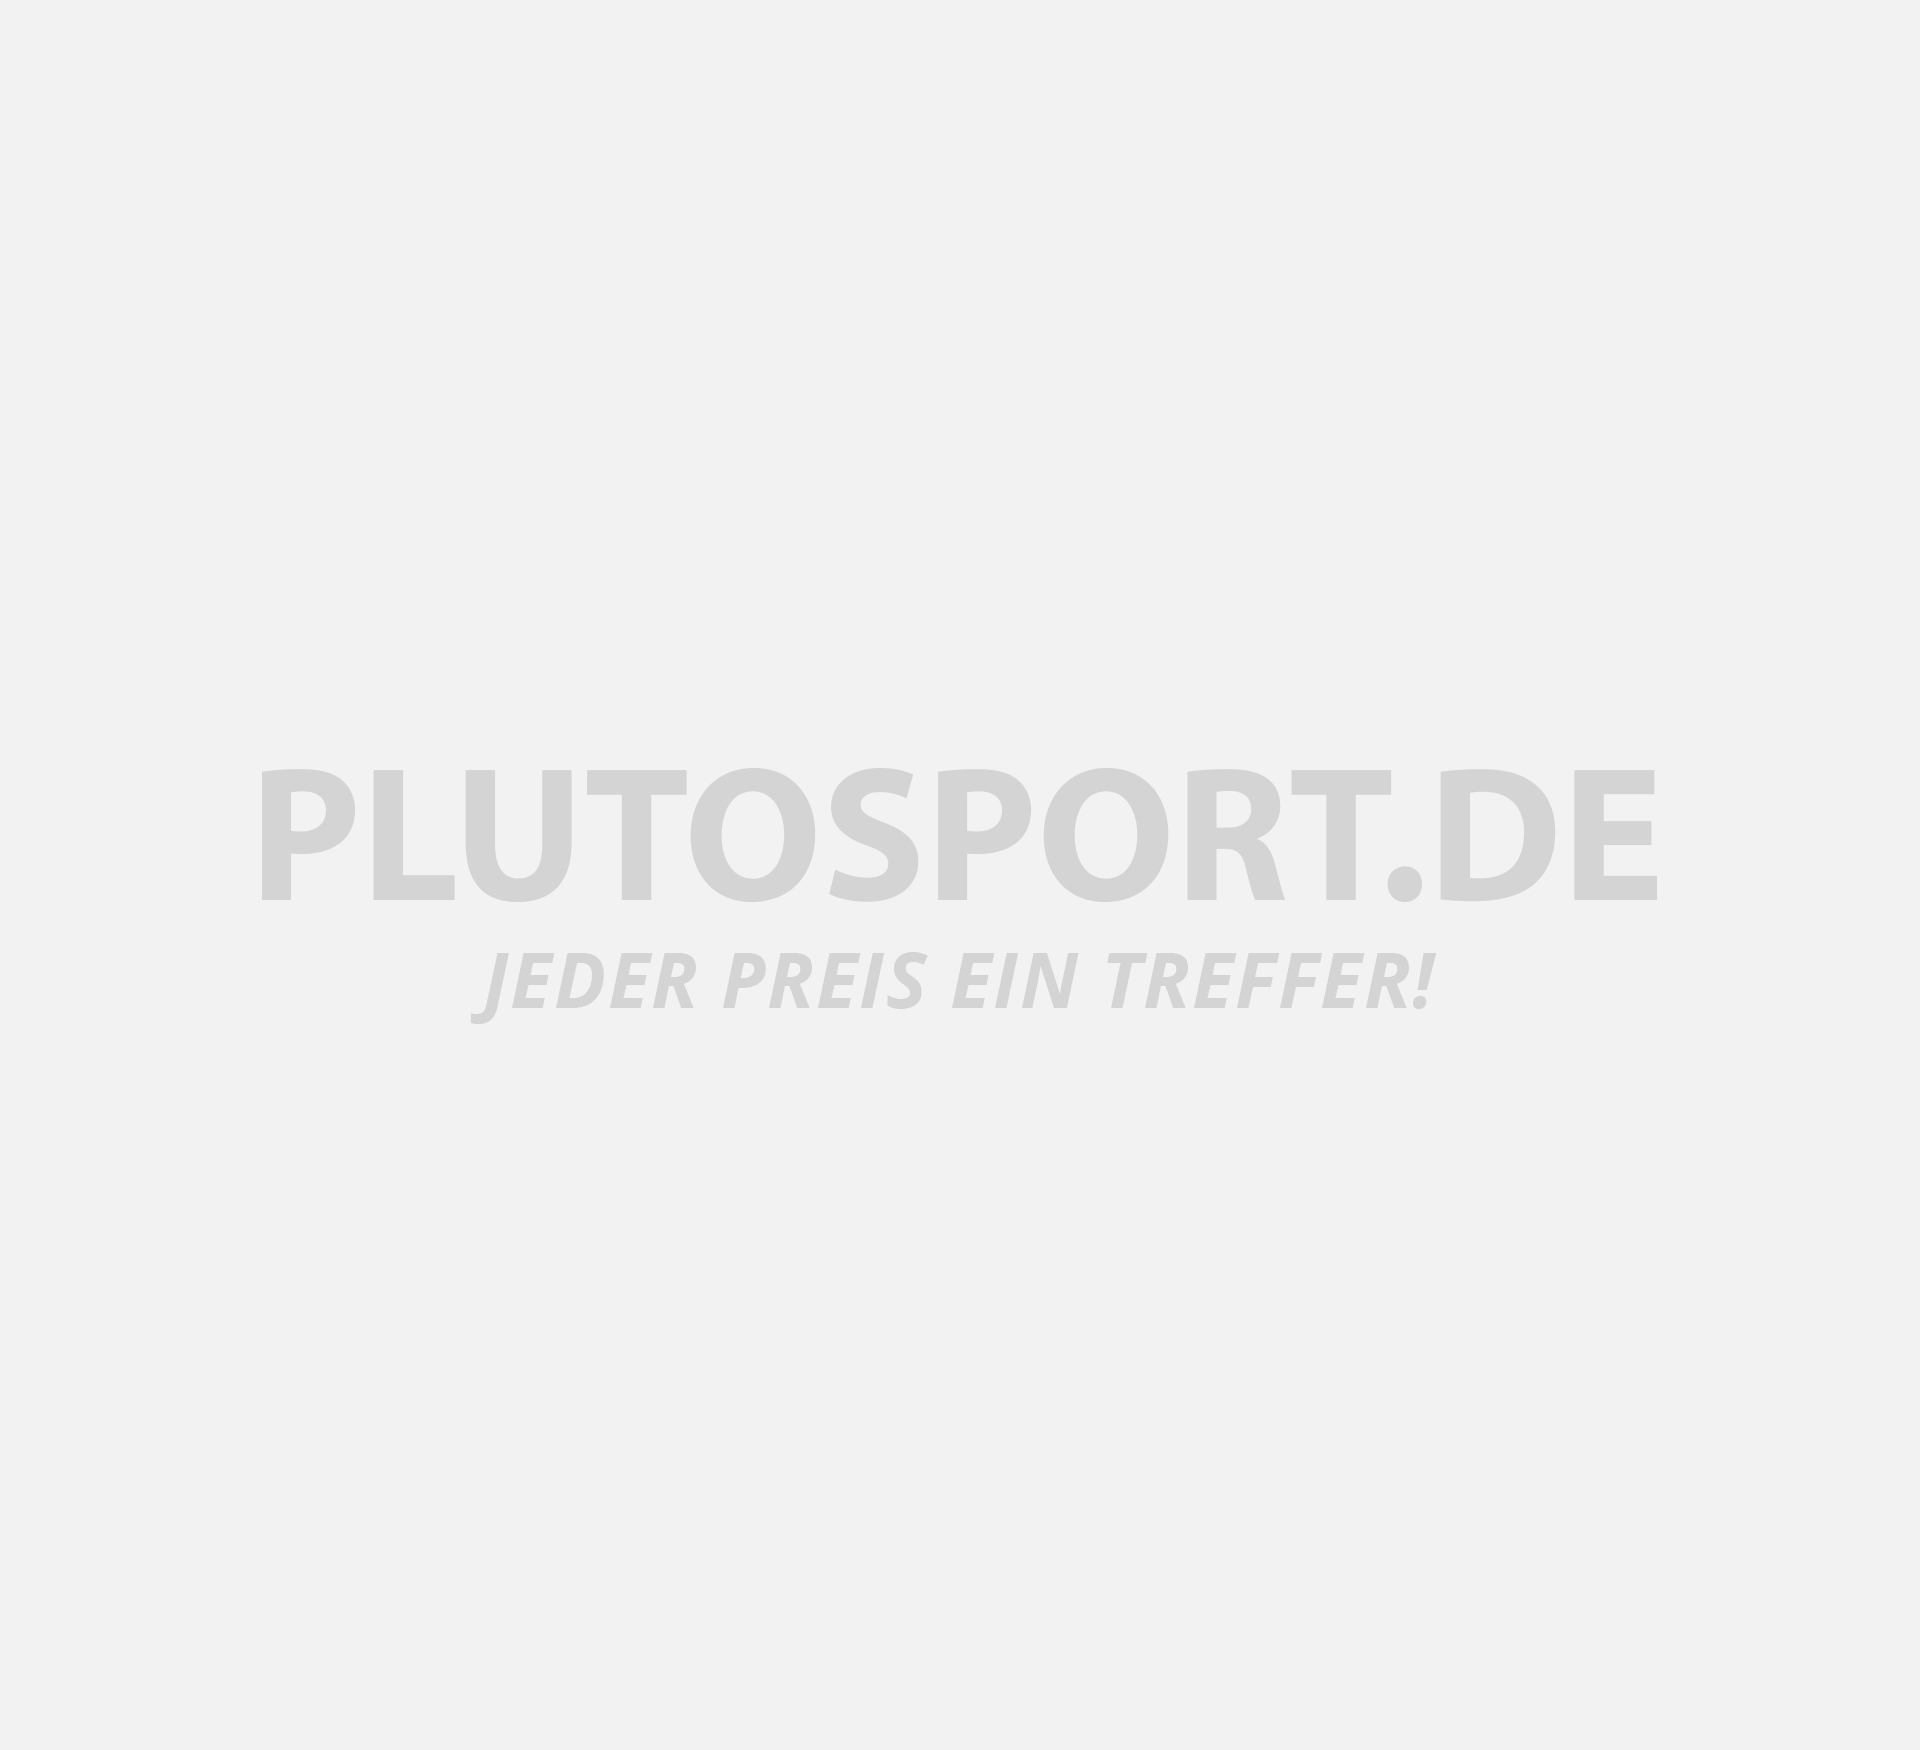 Björn Borg Nordic Camo Sammy Boxershorts Junior (3-pack)